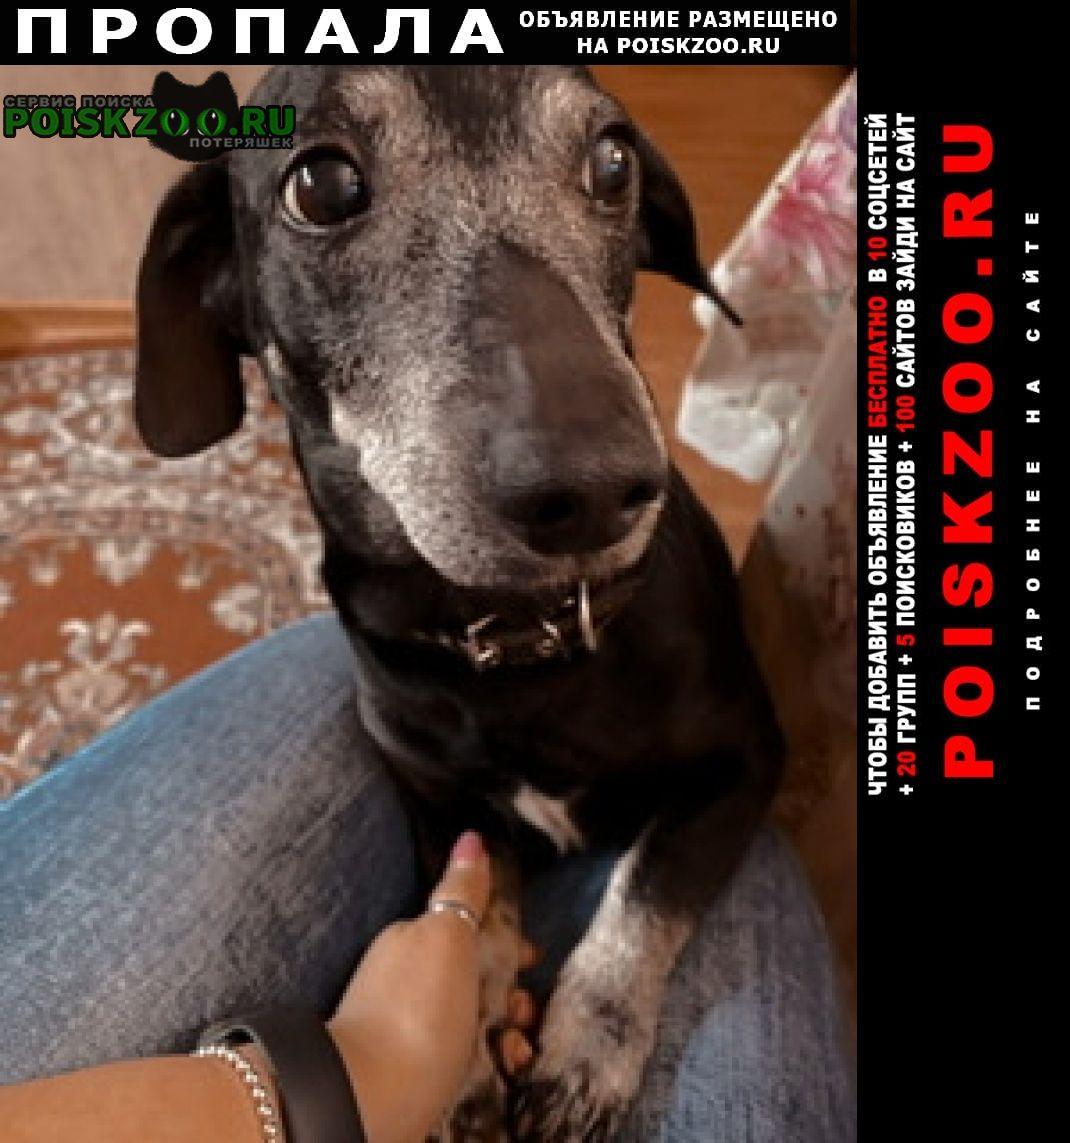 Пропала собака кобель (село бужаниново) Сергиев Посад